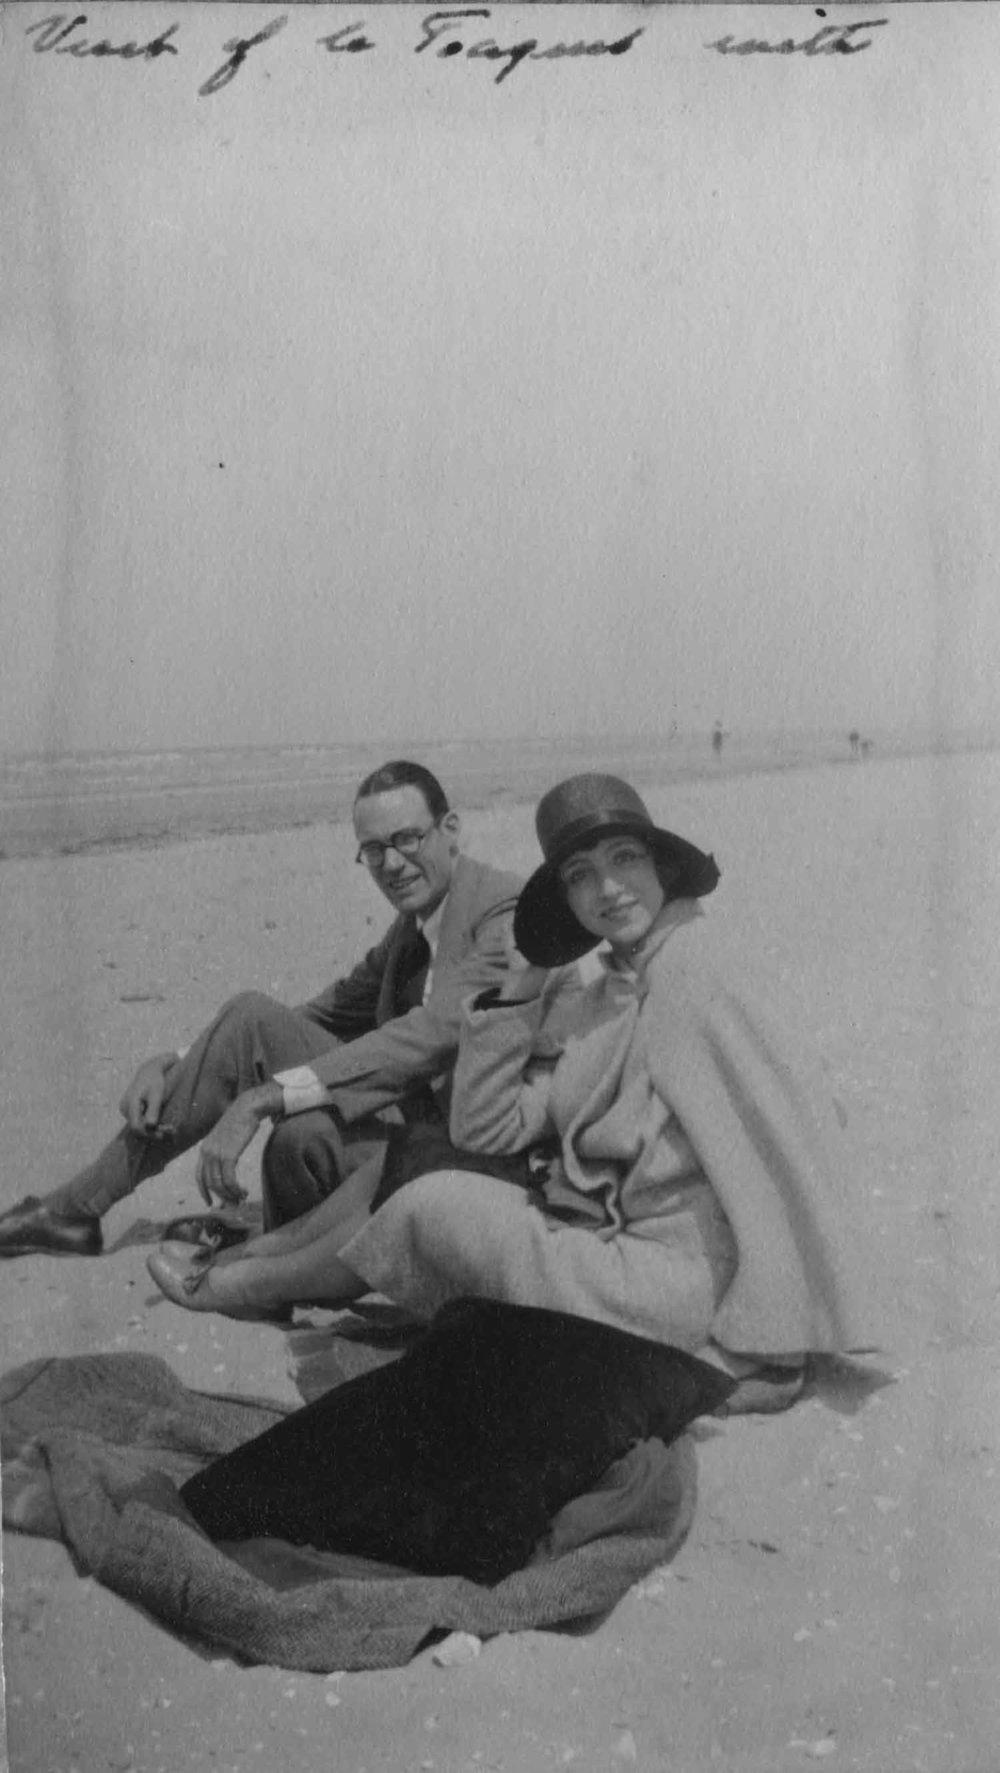 Anais 1928 22 Summer Hugo.jpg